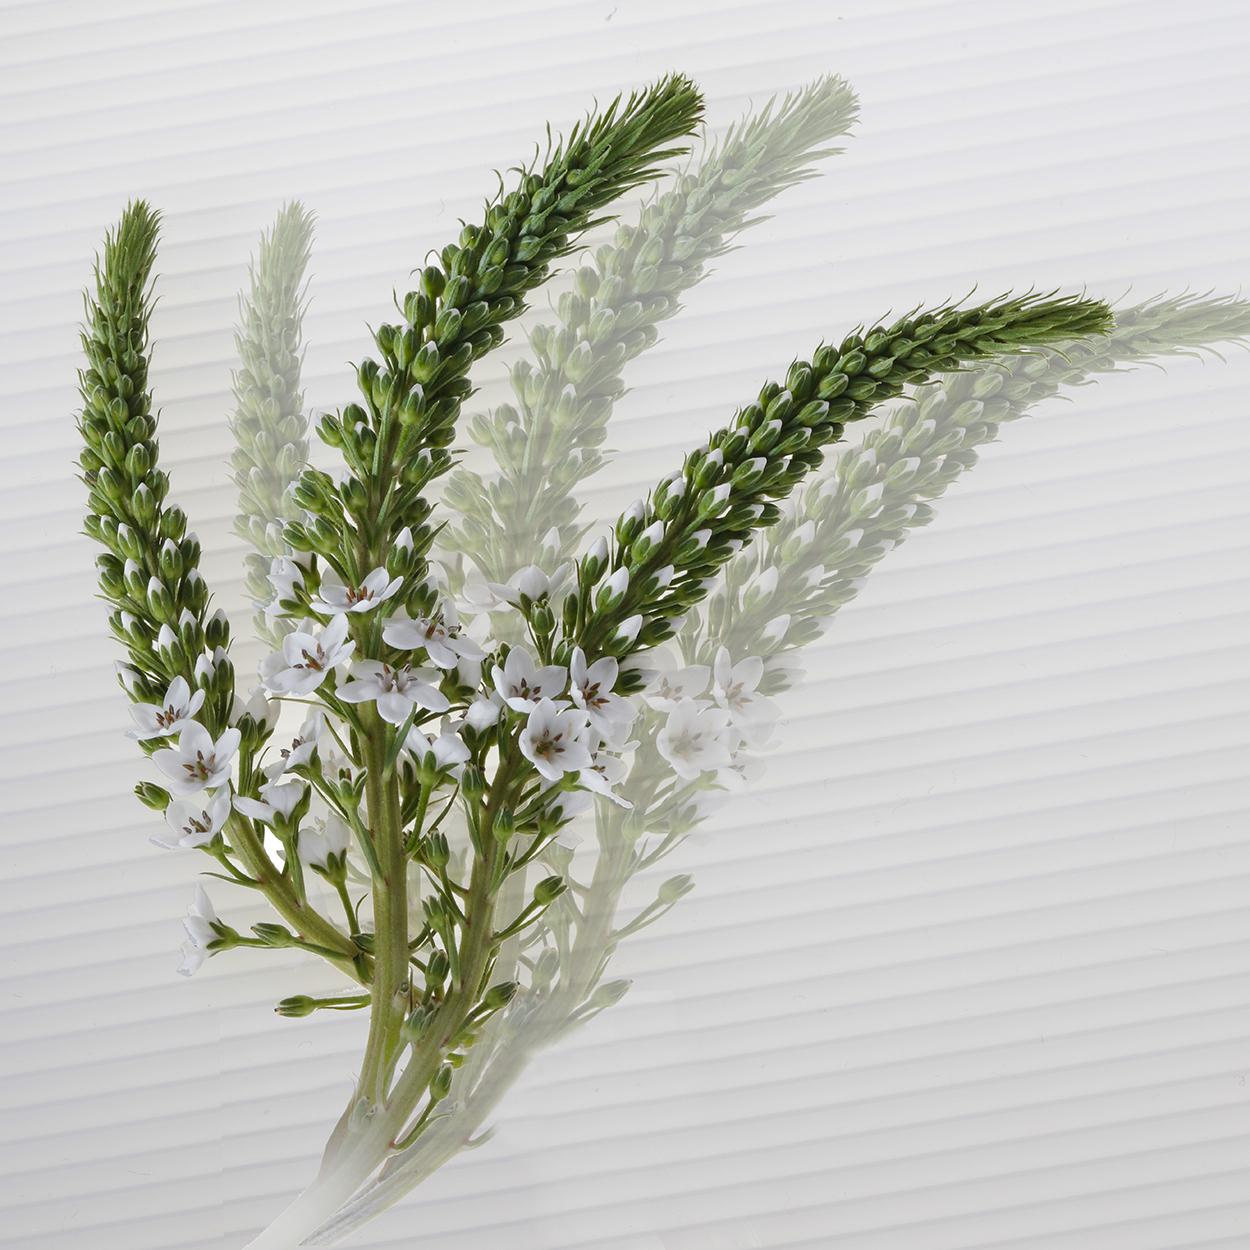 Green Plant Fad  Alt .jpg